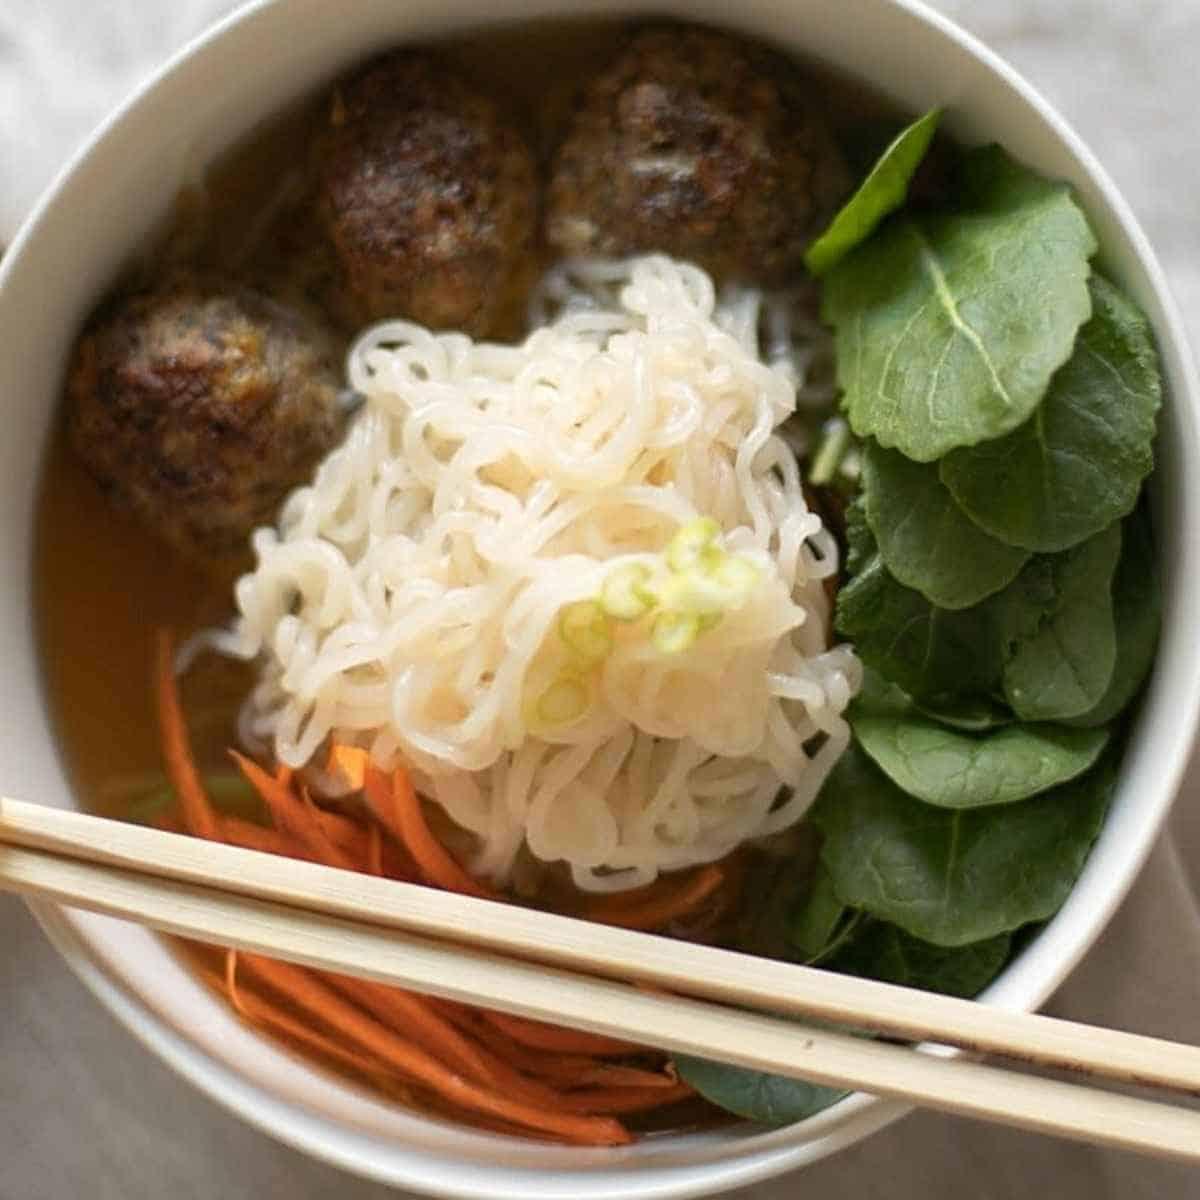 keto meatball soup w noodles - Shirataki: The True Keto Approved Asian Noodle